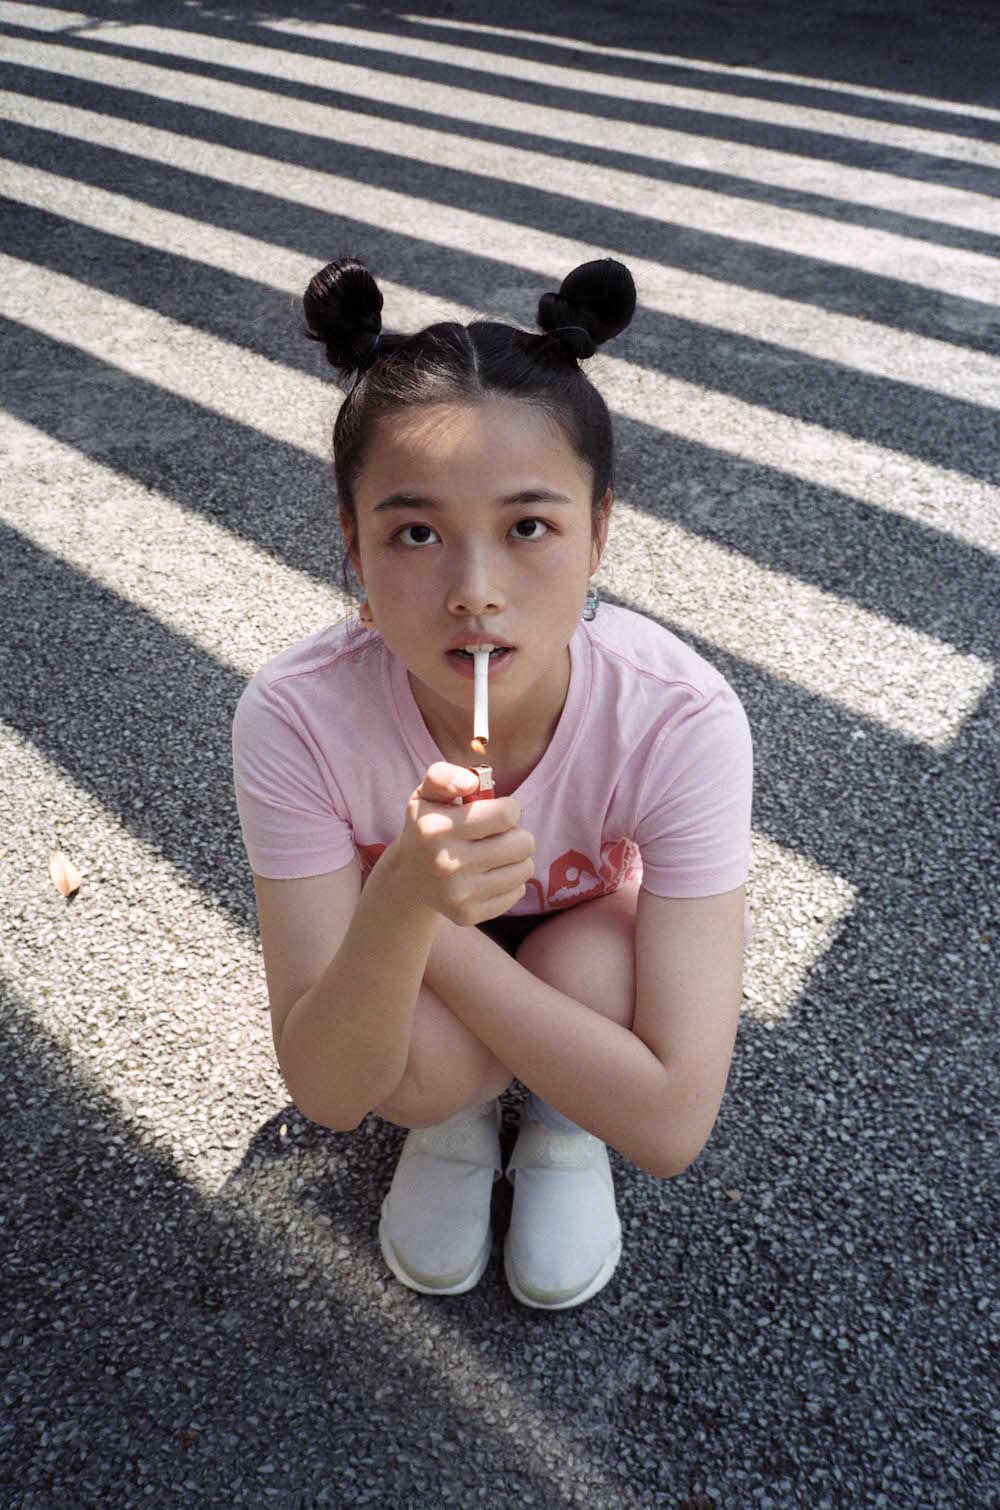 duran-levinson-shanghai-photography-7-1.jpg